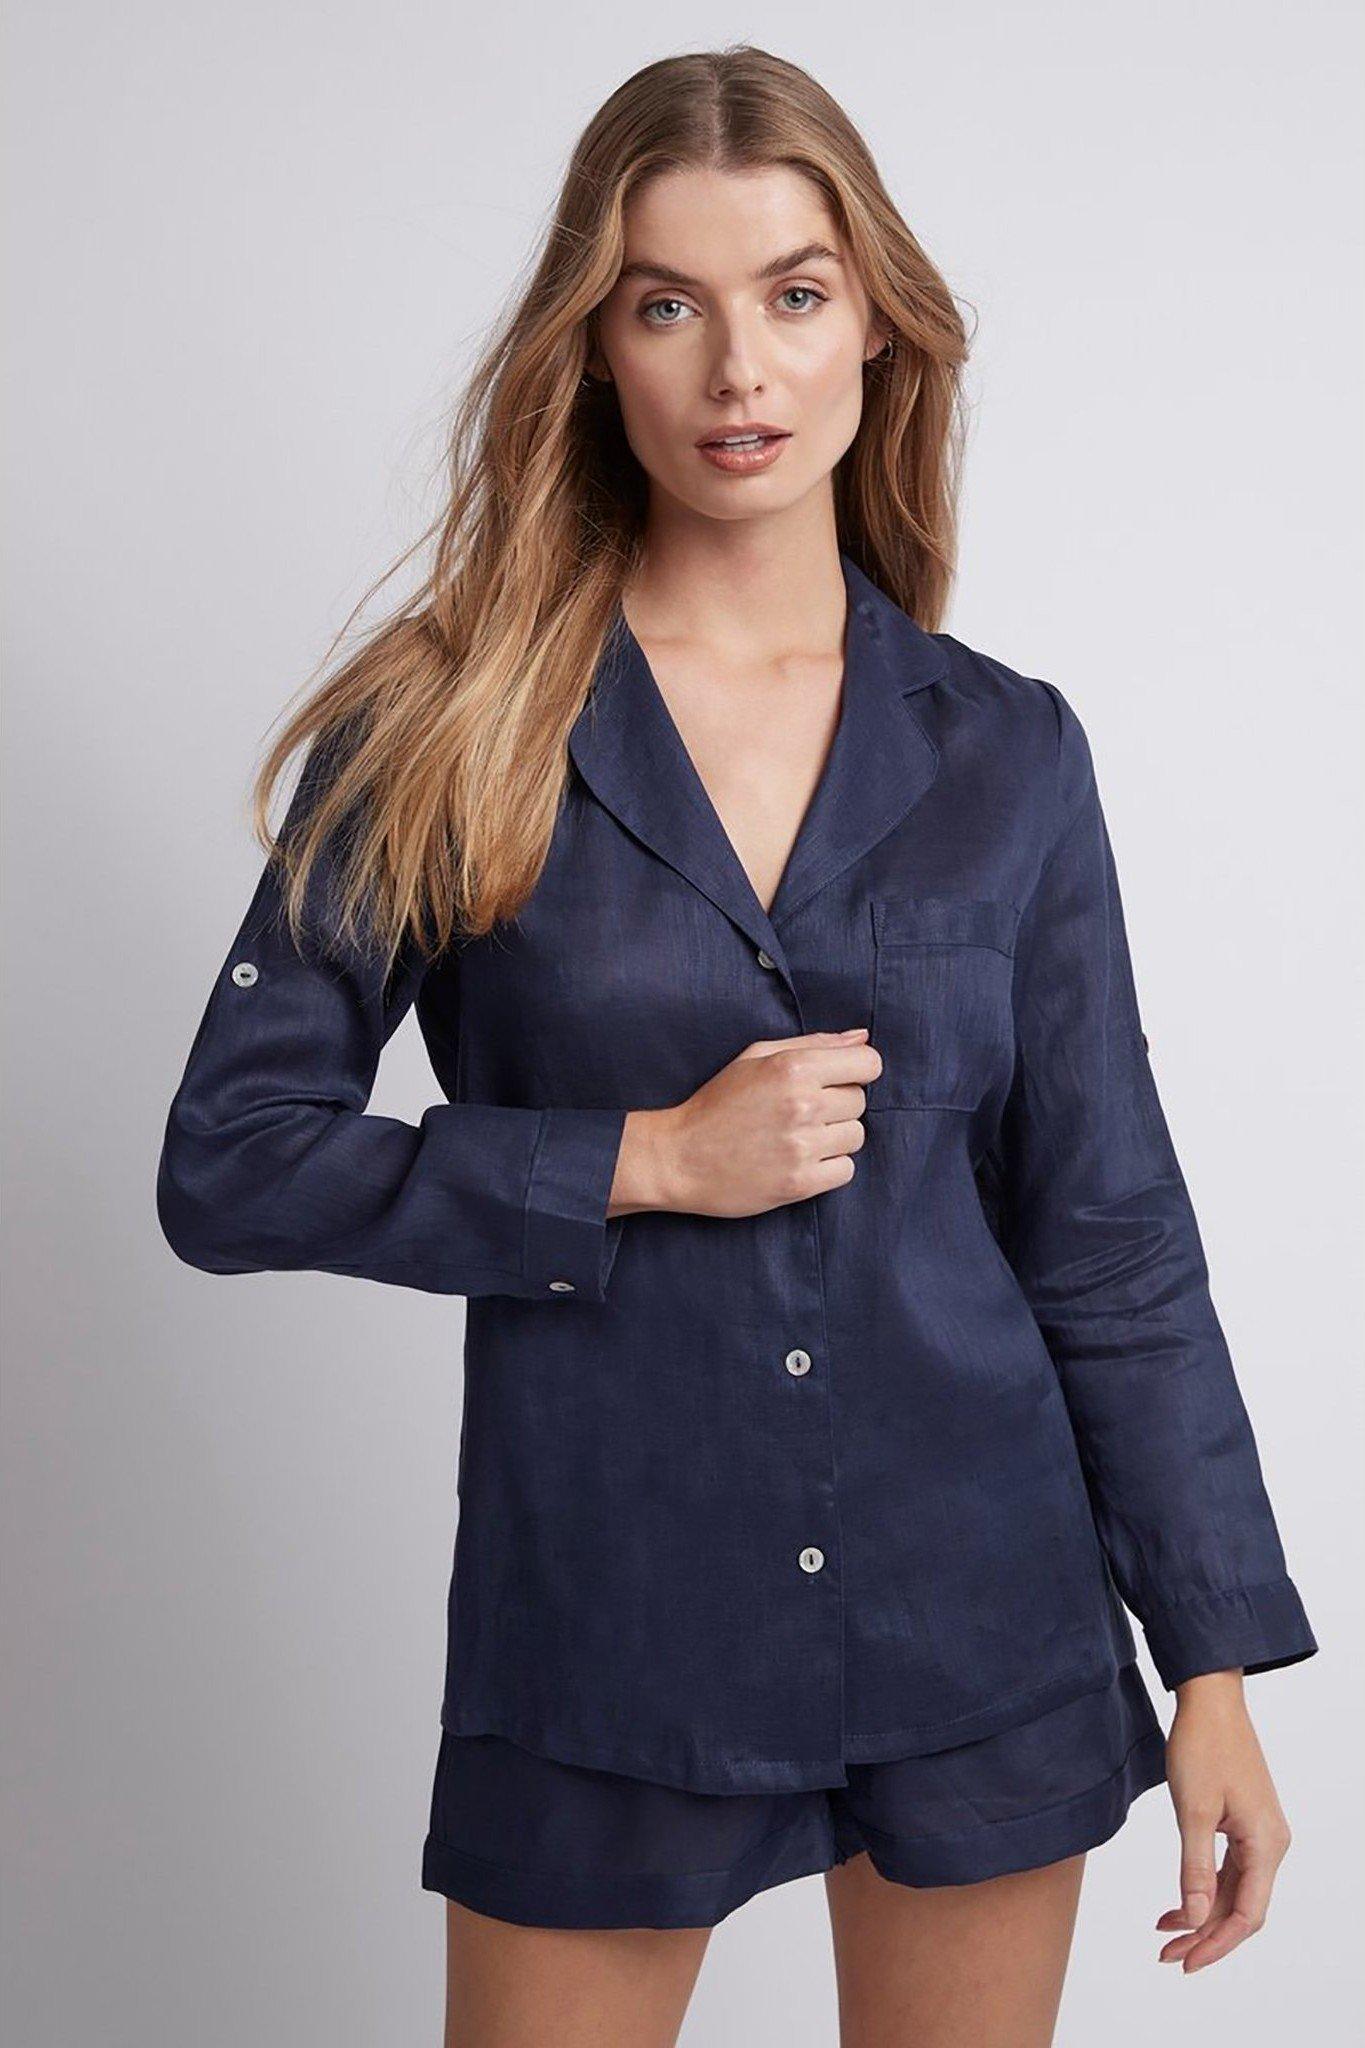 pyjama vải linen xanh dương